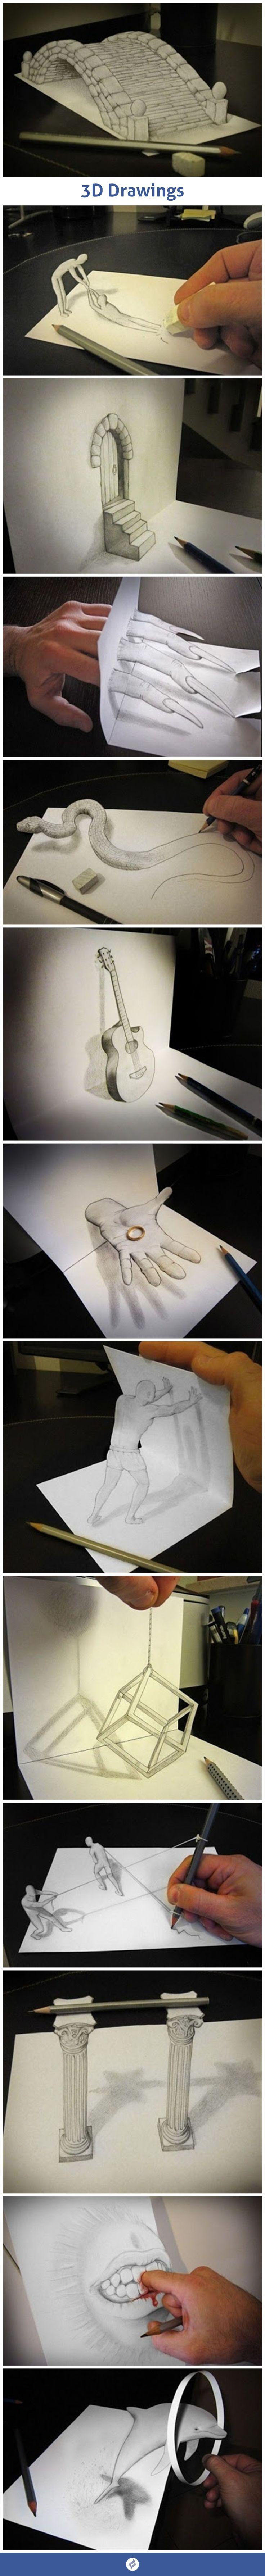 Amazing 3D-Drawings Art  #photuwalebaba